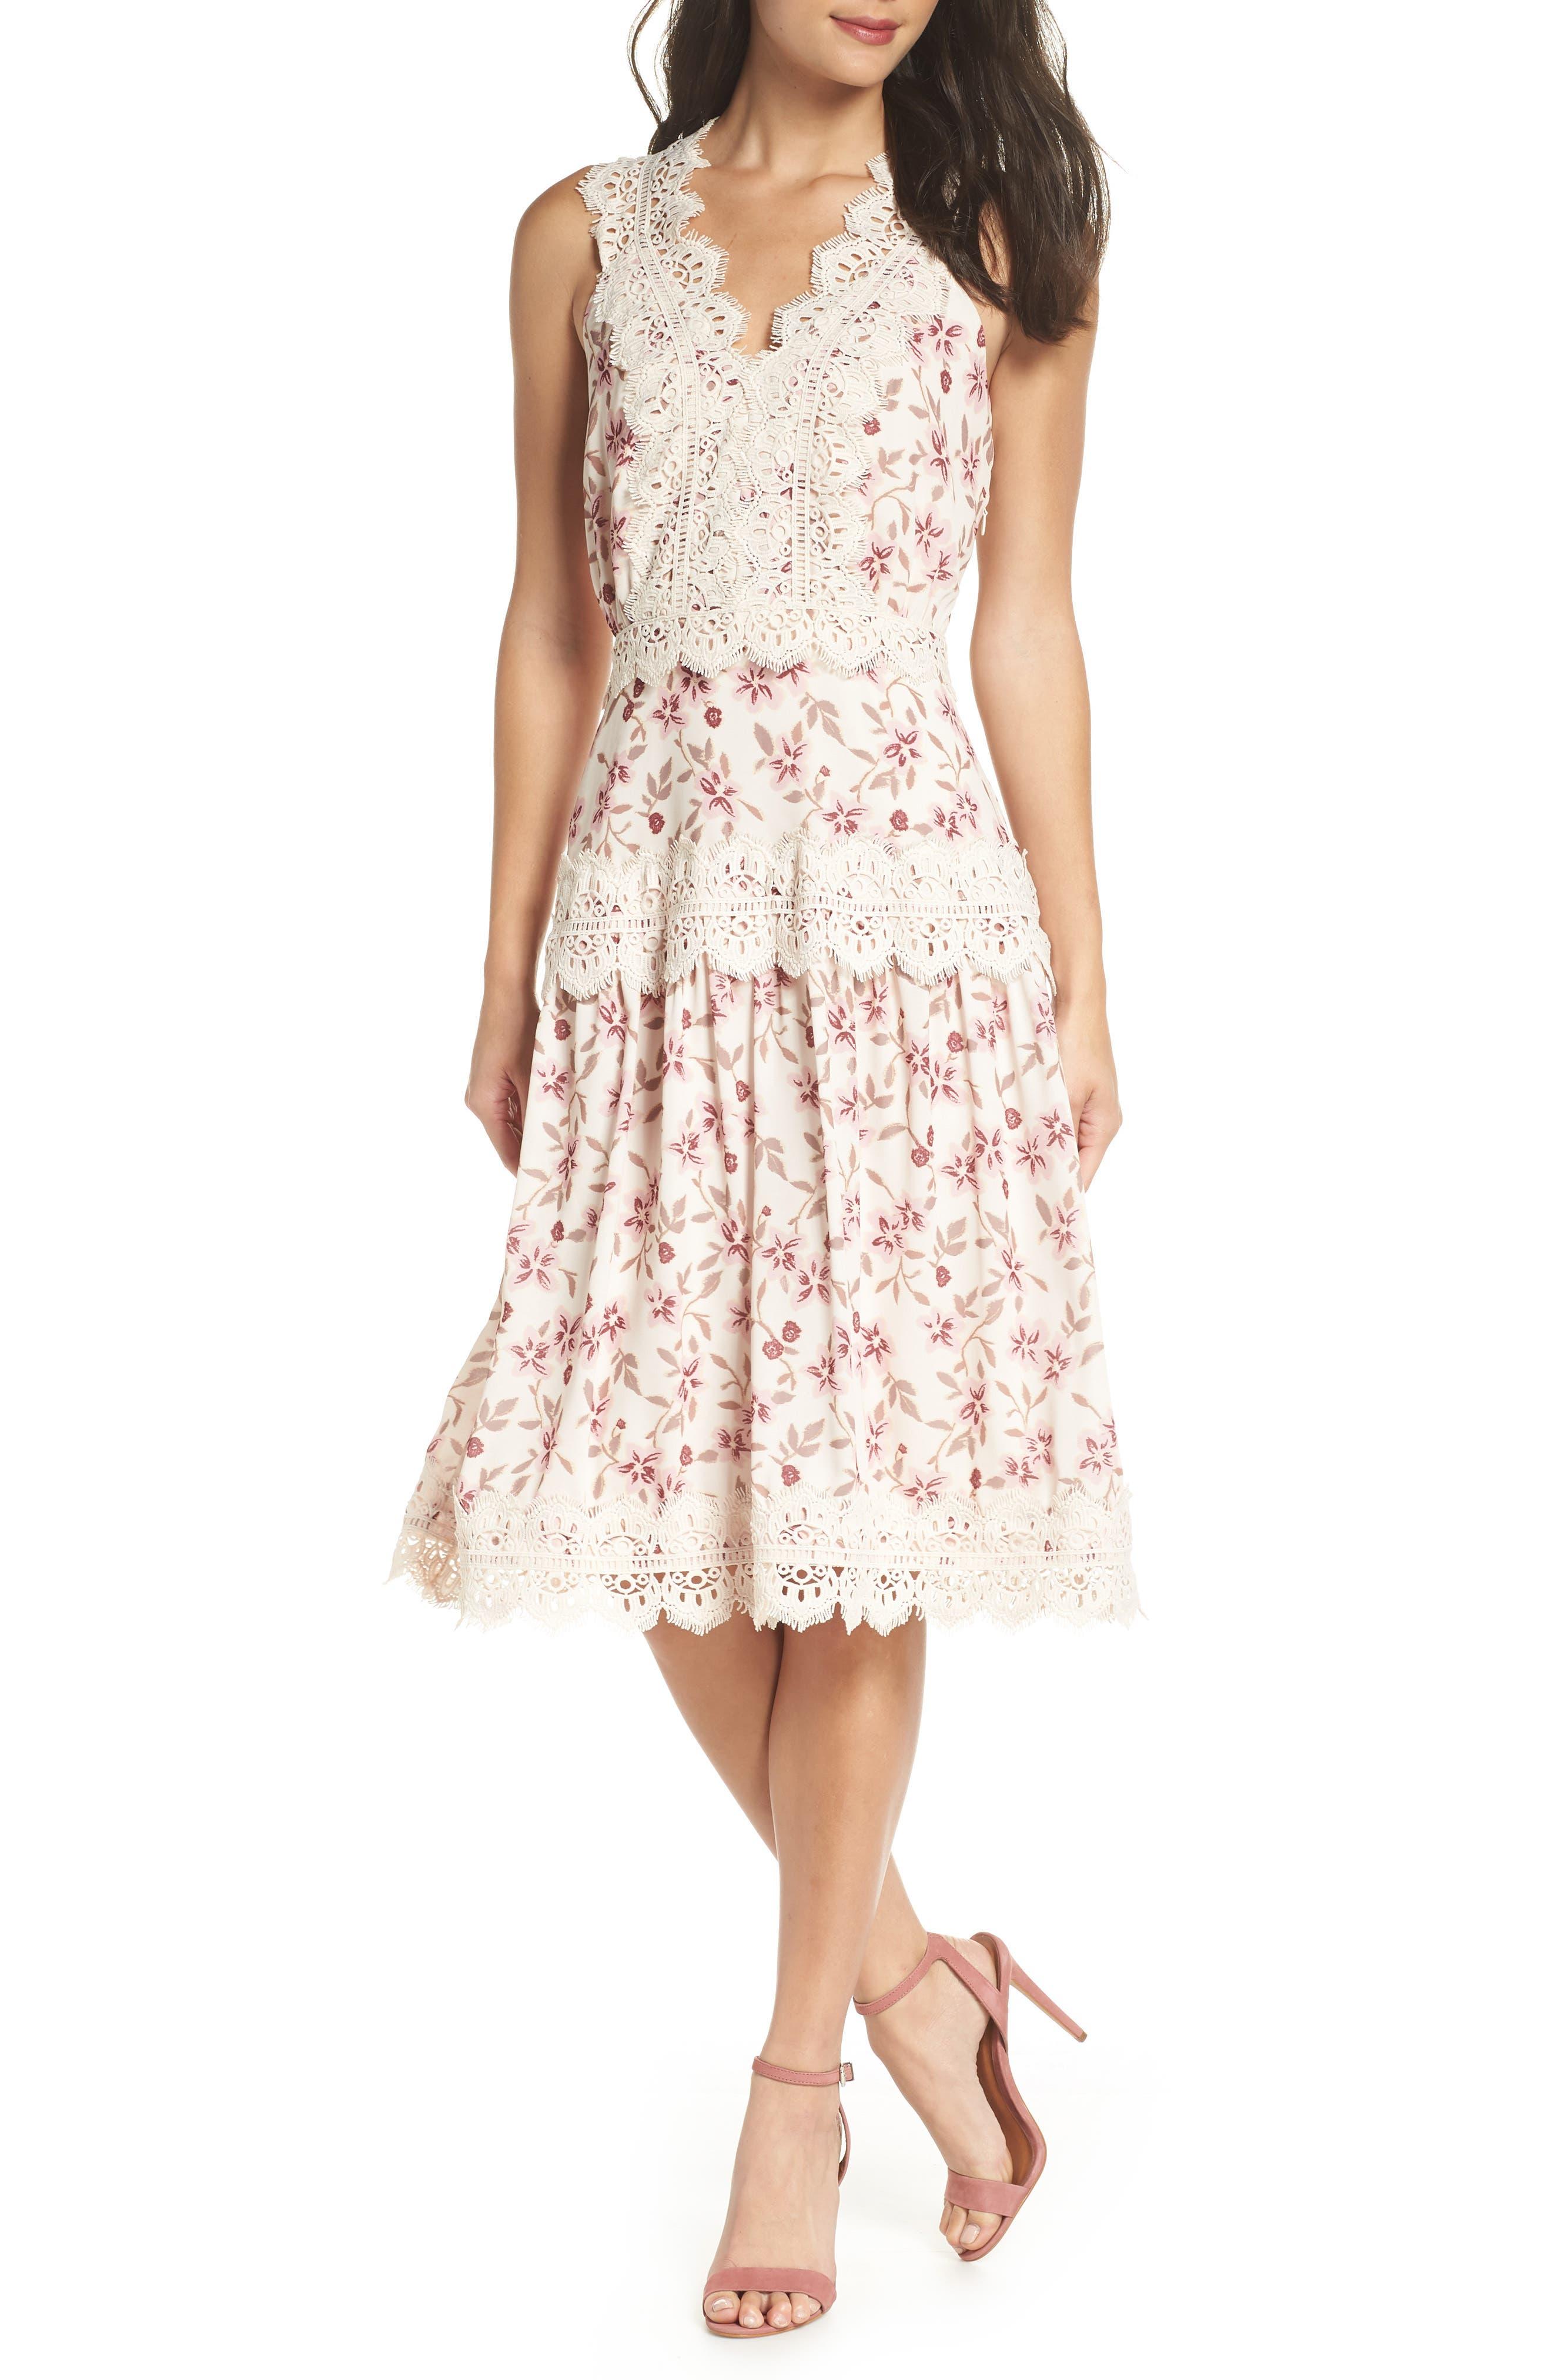 ADELYN RAE Payton Lace Trim A-Line Dress, Cream-Lilac